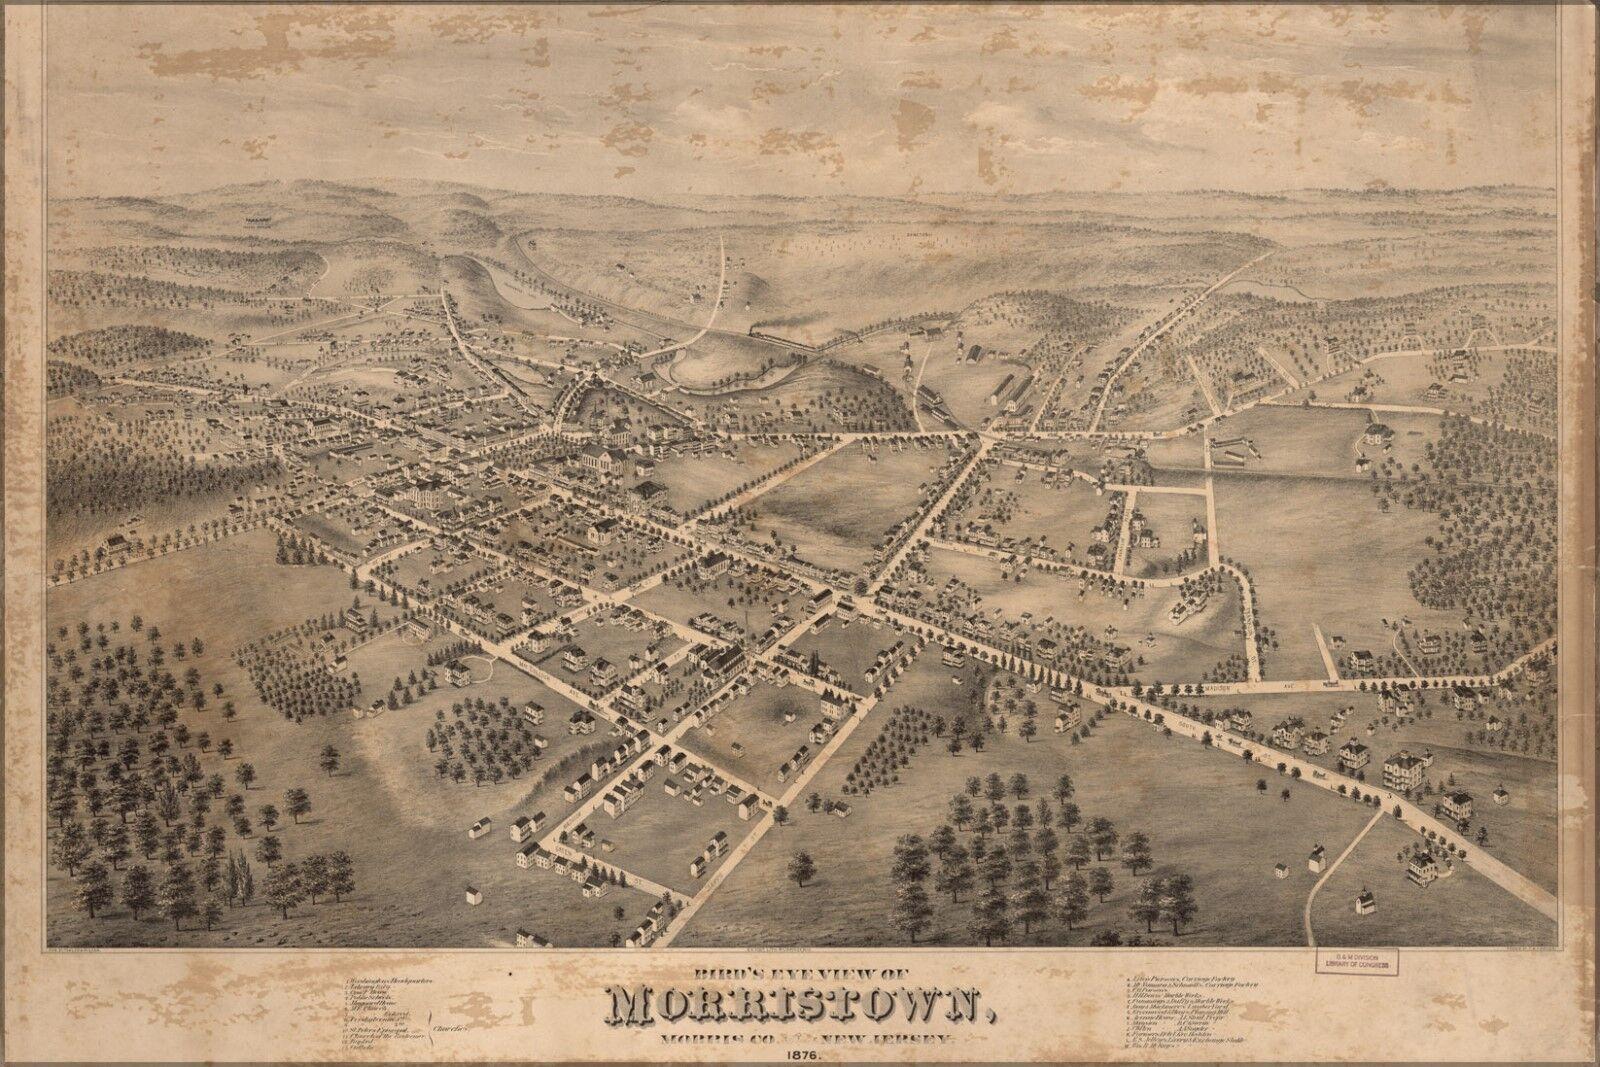 Poster, Molte Misure; Birdseye Vista Mappa Del Morristown, New Jersey 1876